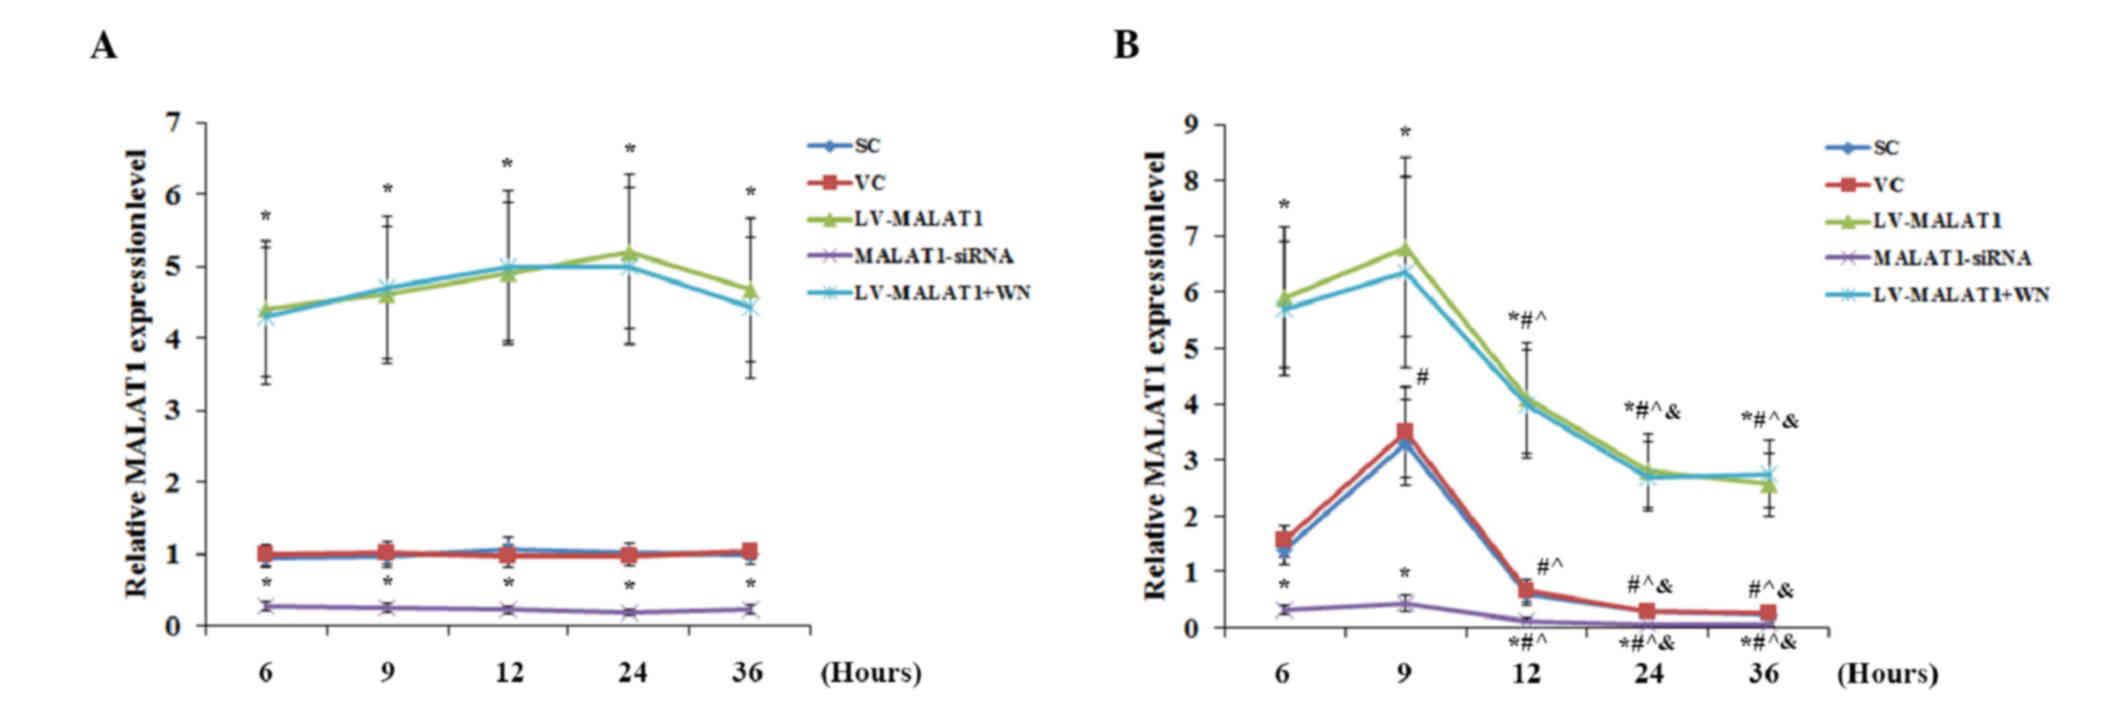 Long noncoding RNA MALAT1 inhibits apoptosis induced by